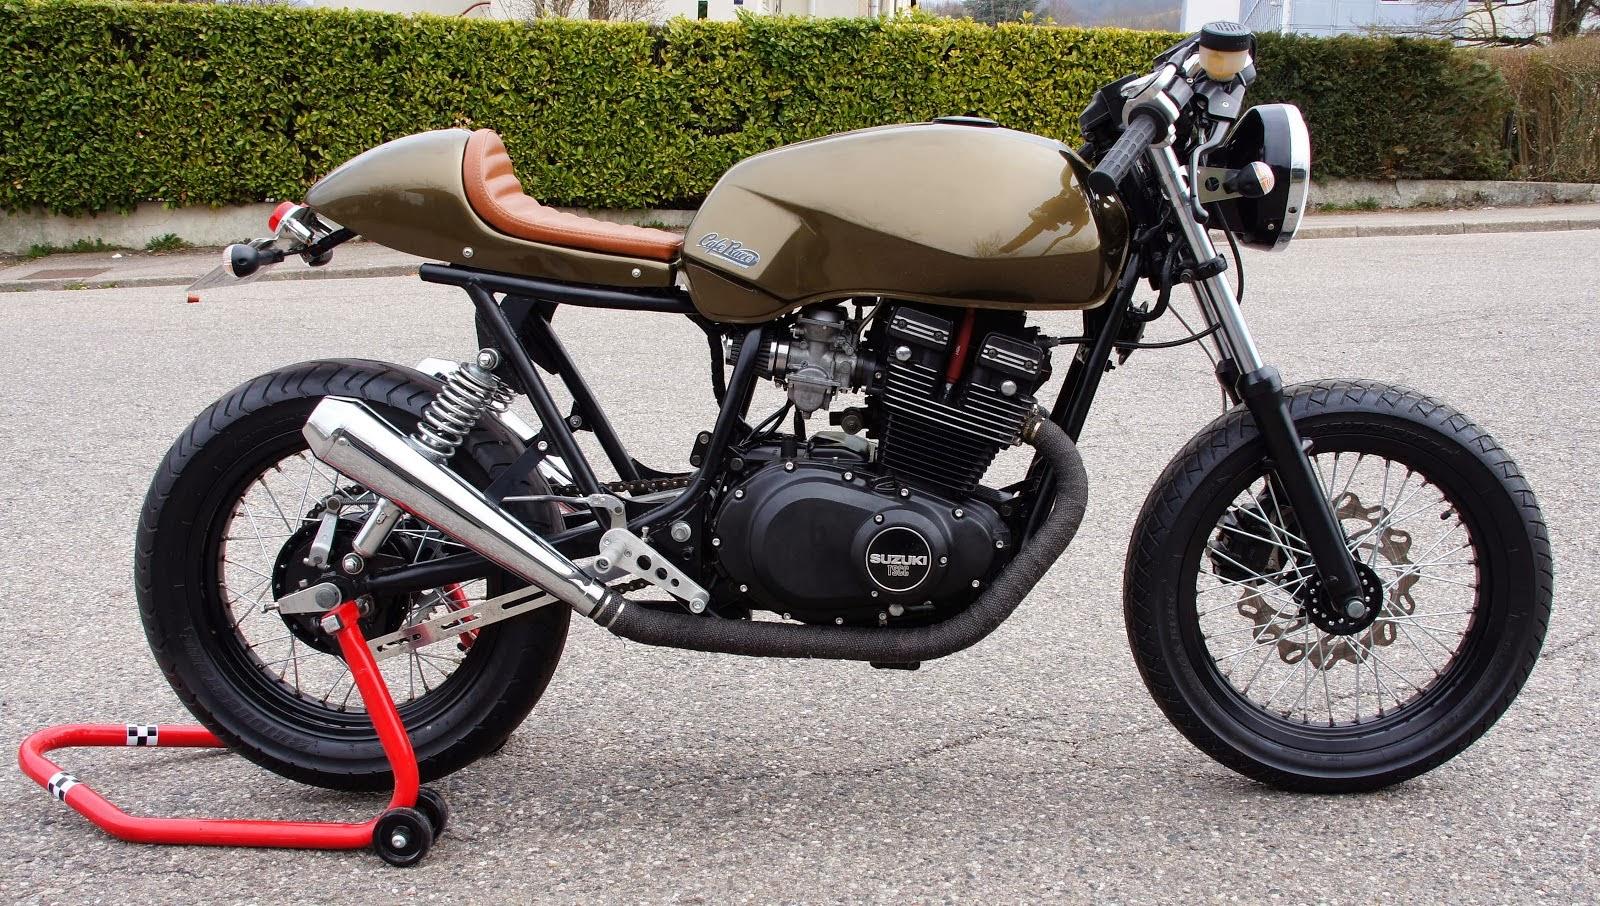 Suzuki+GSX+400+Cafe%25CC%2580+Racer+01 Yamaha Mio Mx Wiring Diagram on yamaha sniper mx, yamaha filano, yamaha motorcycles, yamaha nouvo mx, yamaha yamaha, yamaha vega force, yamaha jupiter mx 2014,